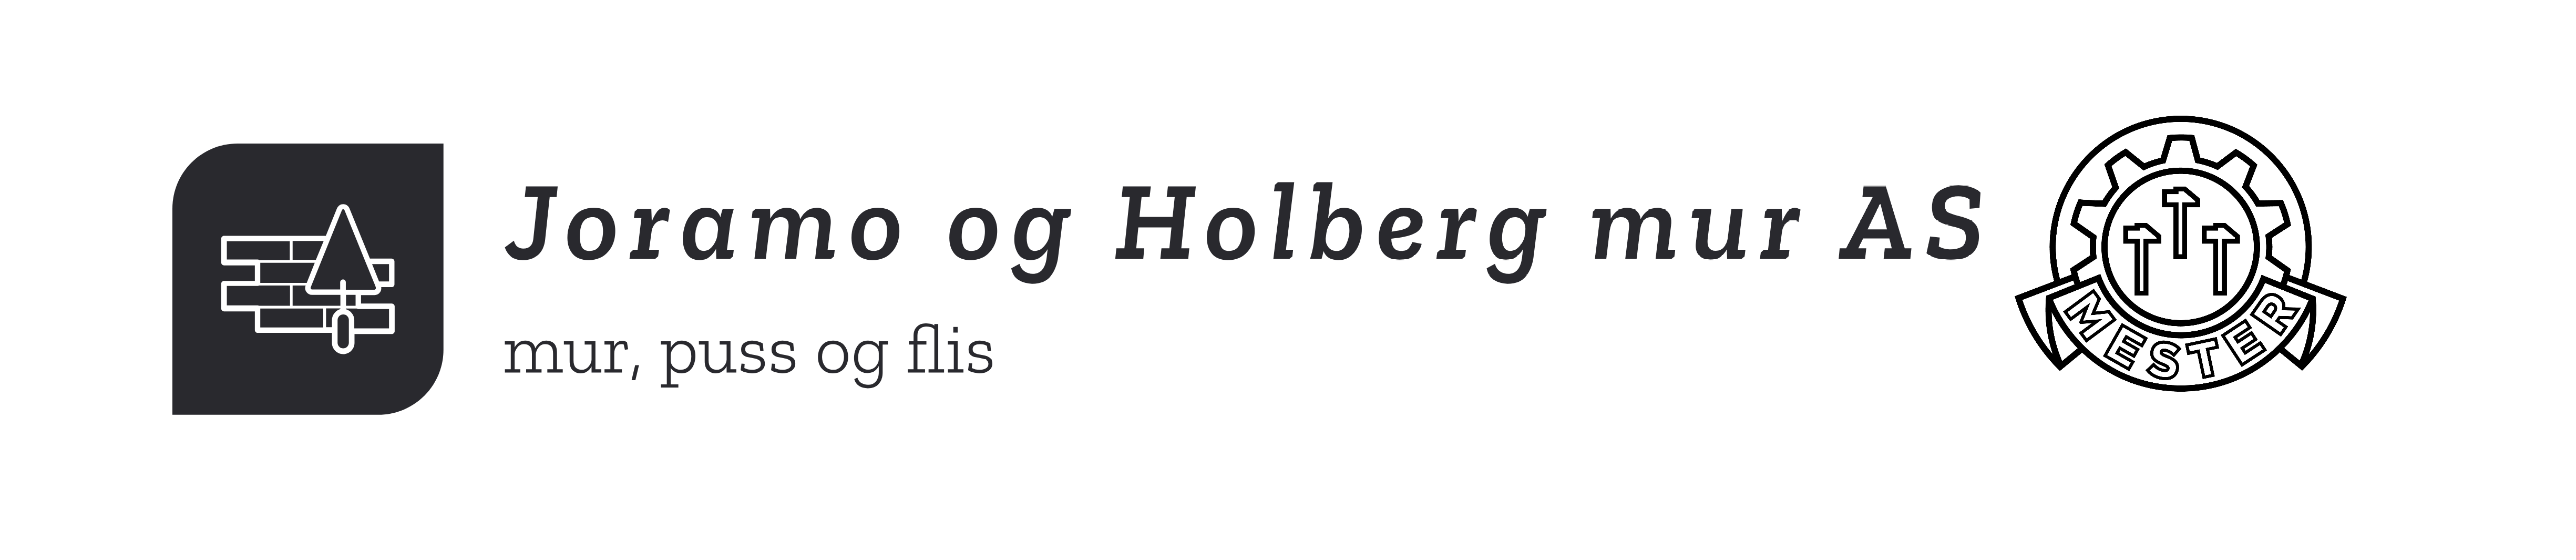 Joramo og Holberg mur AS